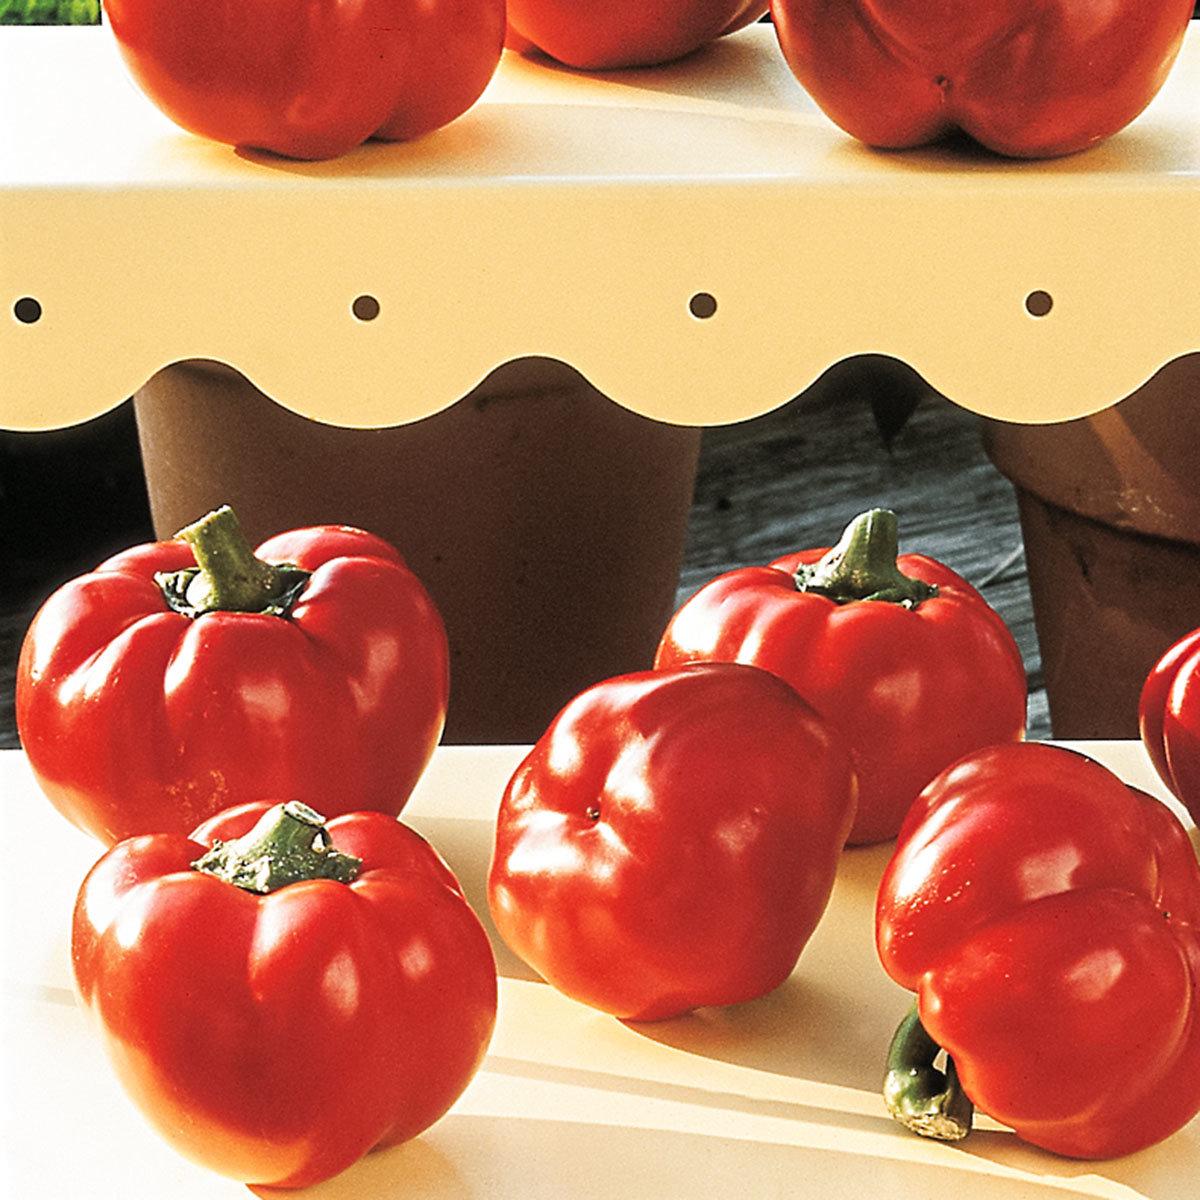 Paprikapflanze Ungarische Tomatenpaprika, veredelt, im ca. 11 cm-Topf